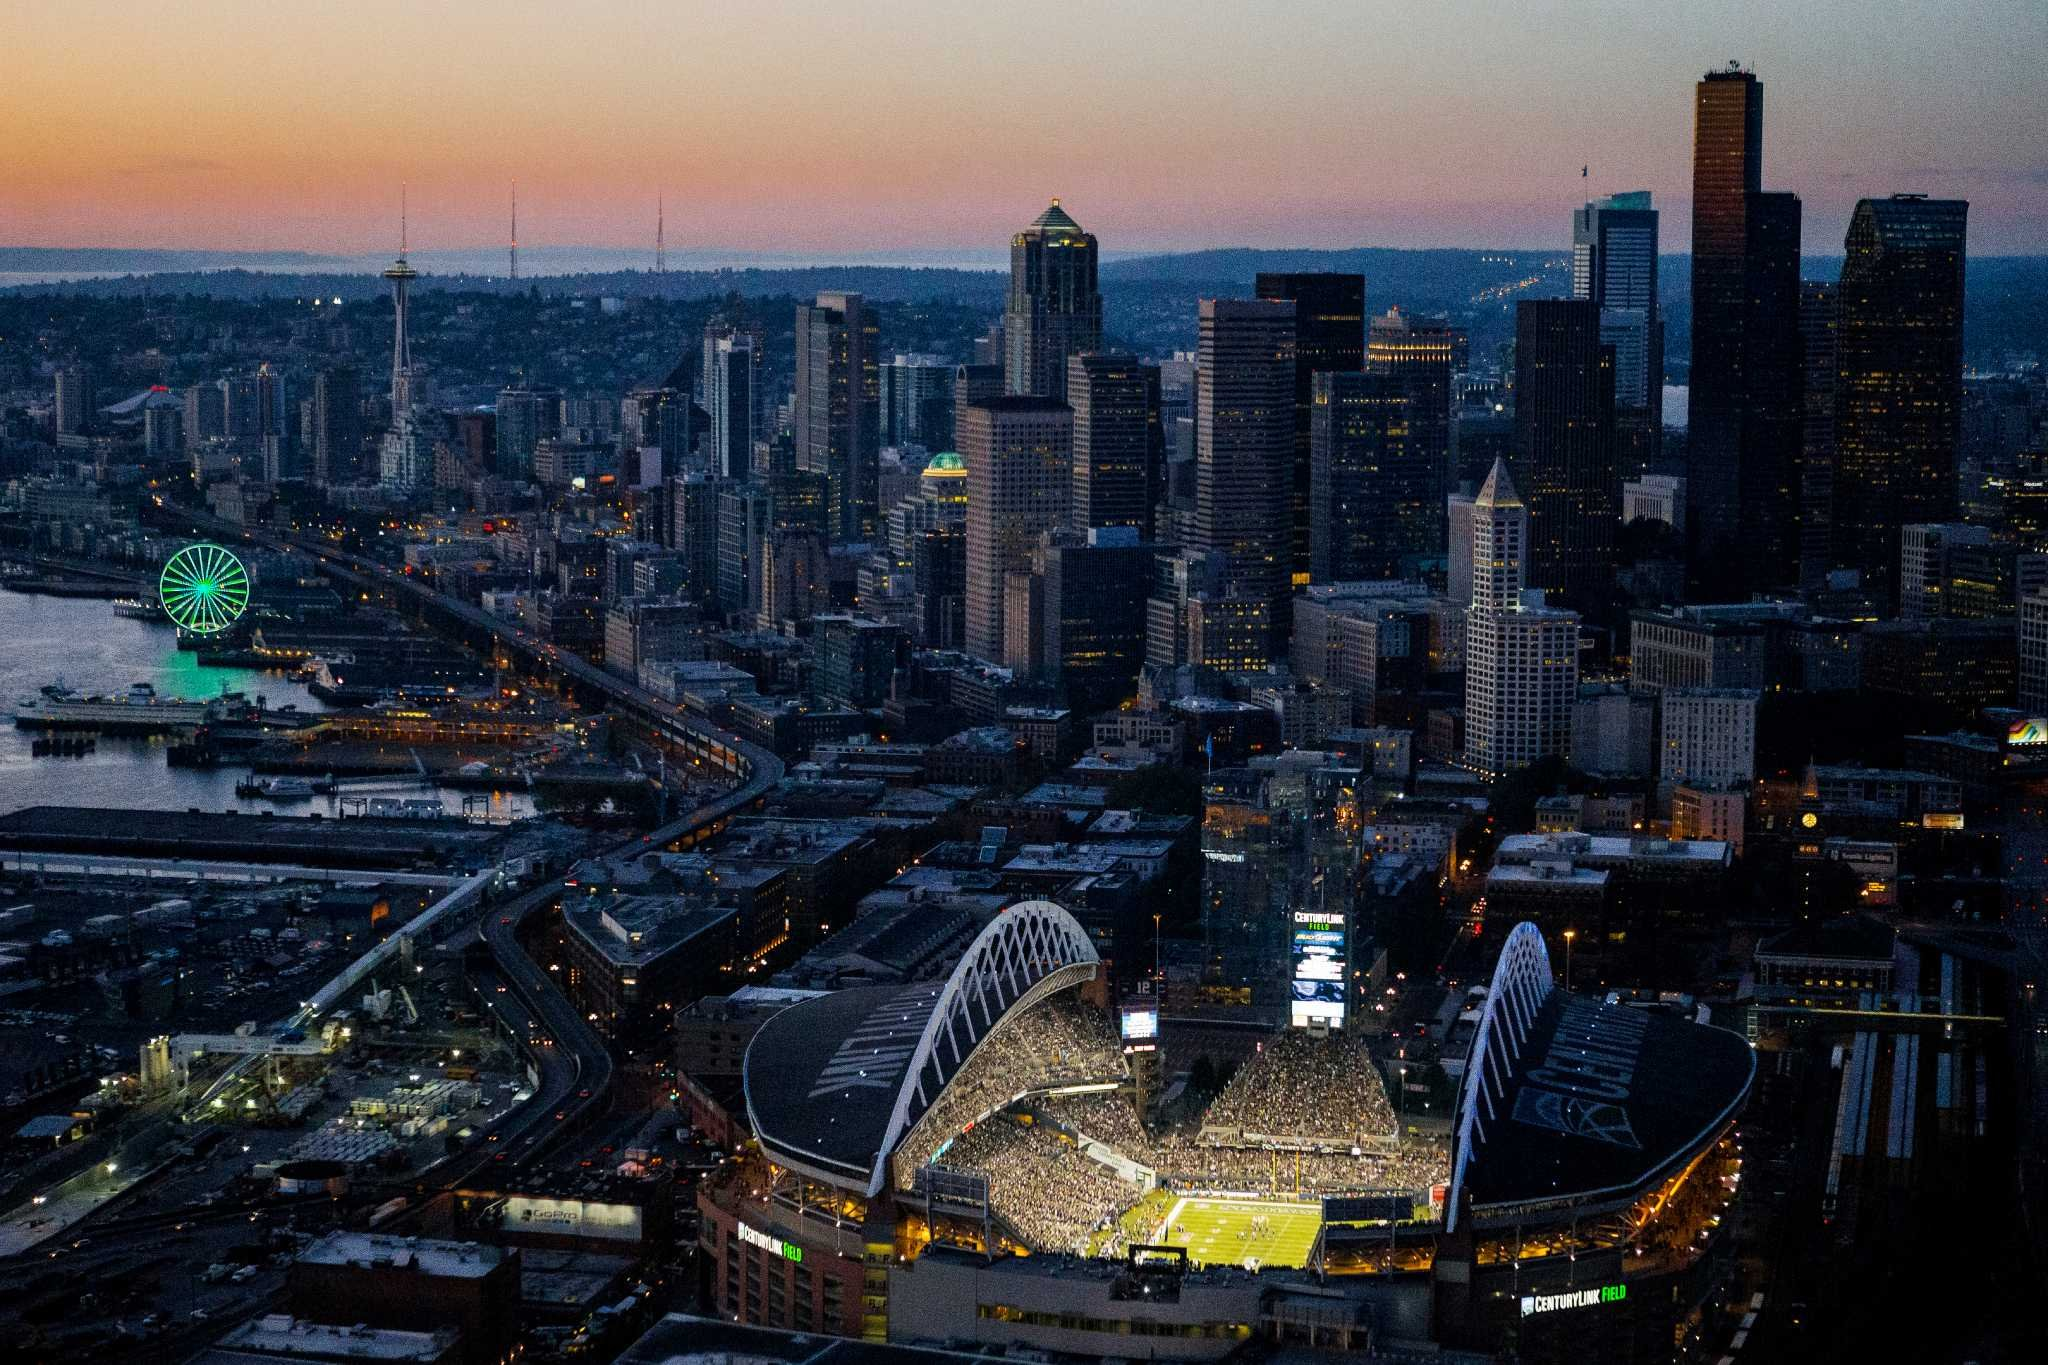 SEATTLE SEAHAWKS nfl football city cities stadium wallpaper background 2048x1365